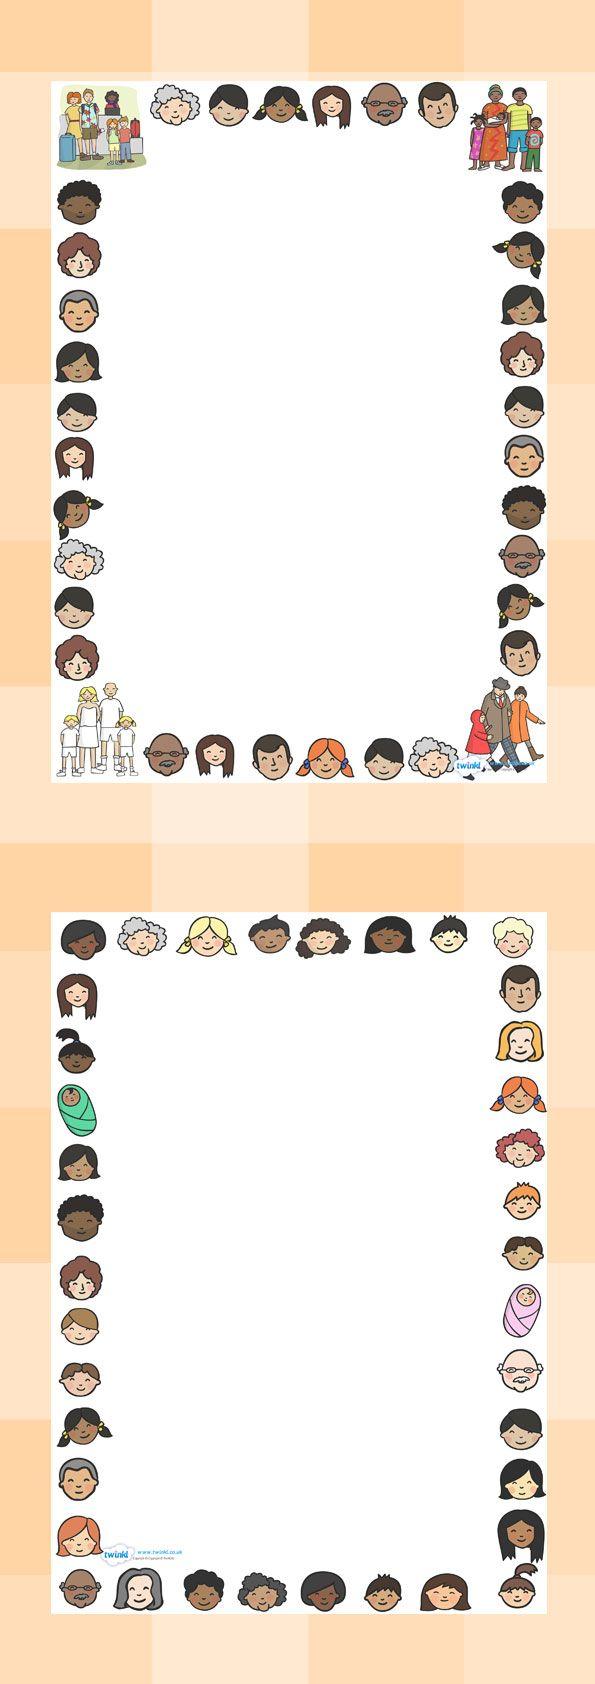 Free Page Border Templates For Microsoft Word Simple Pinκουσ Κους On Οικογενειαmy Family  Pinterest